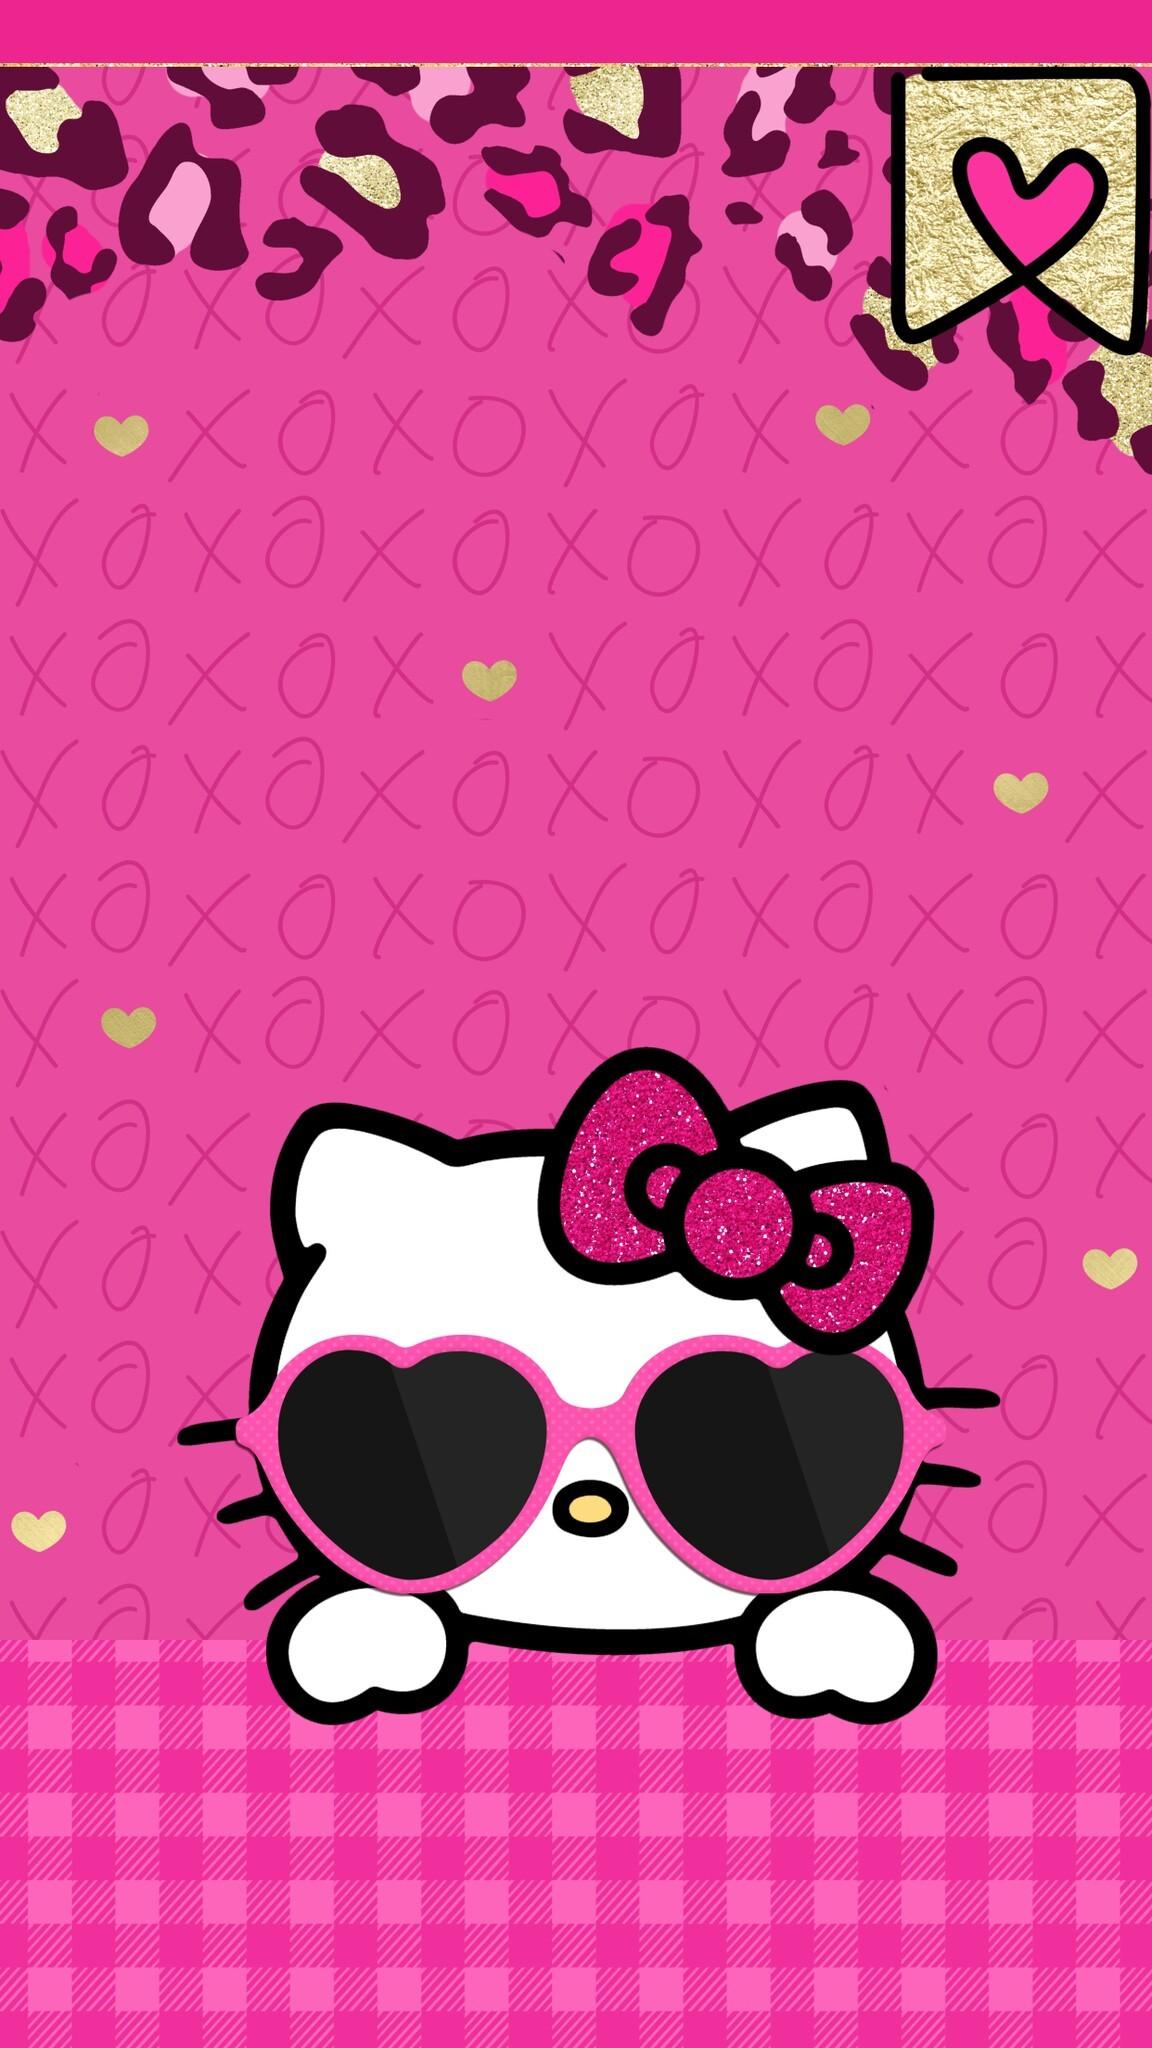 Beautiful Wallpaper Hello Kitty Punk - 879869-hello-kitty-pictures-wallpaper-1152x2048-phone  Image_71648.jpg